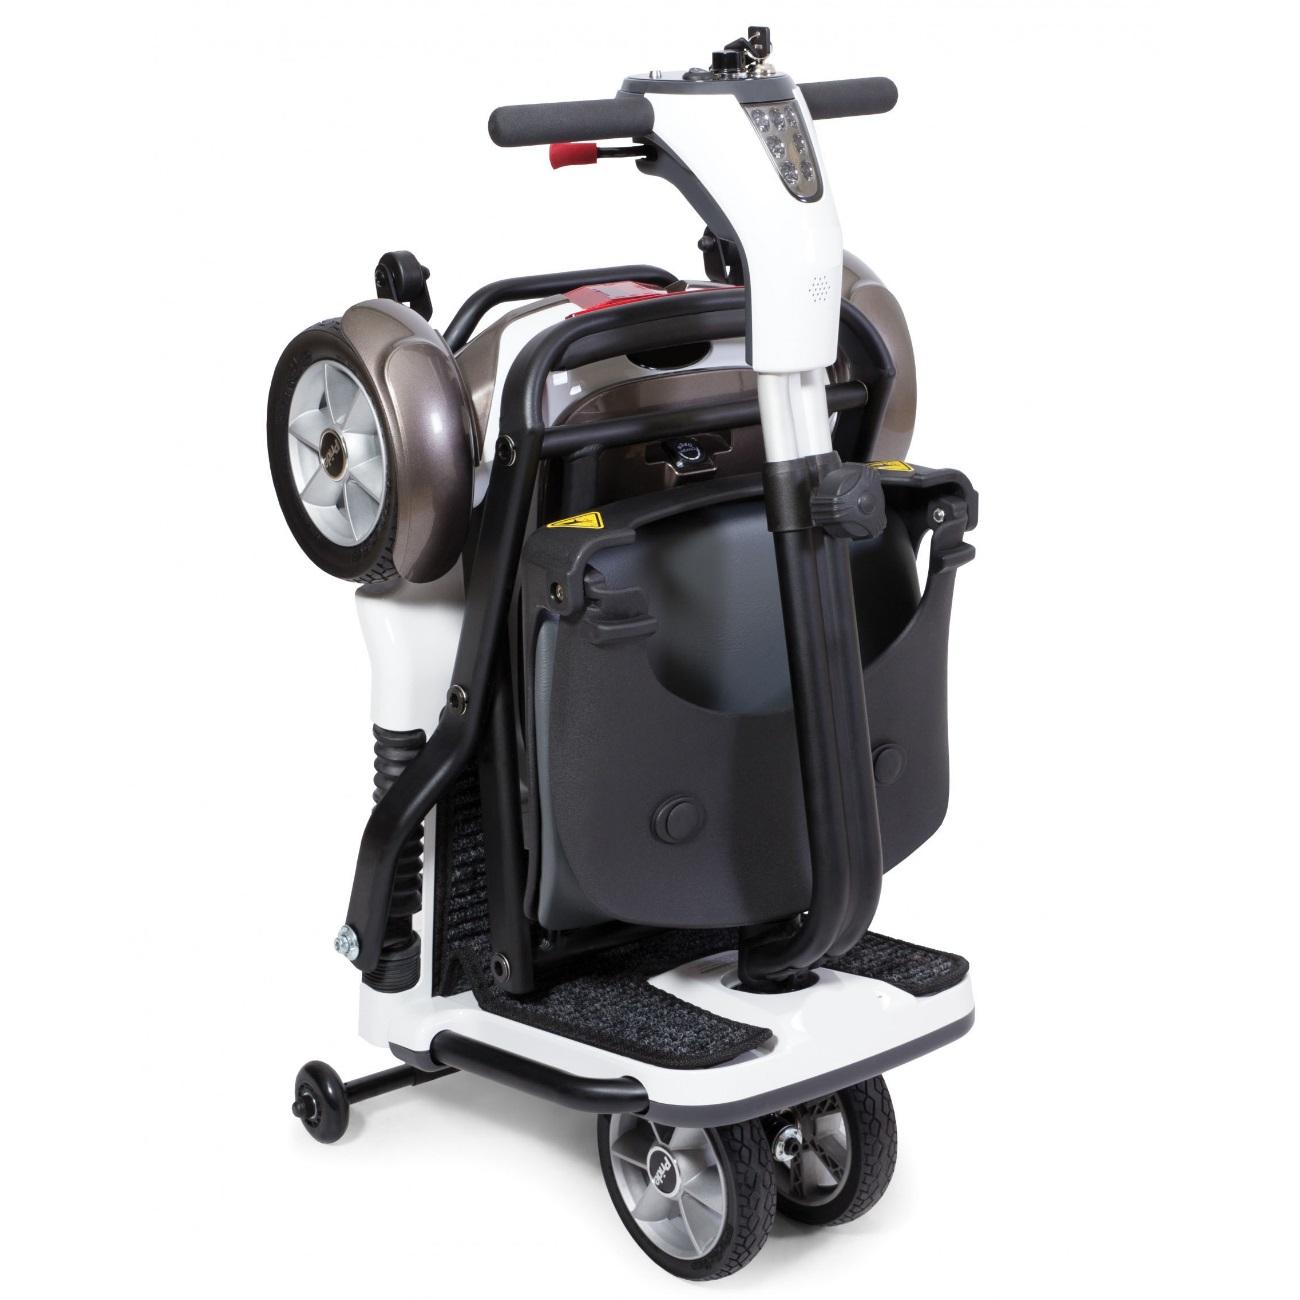 Scooter Led Beleuchtung | Faltbares Reise Elektromobil Holiday Bei Seeger24 Seeger24 De